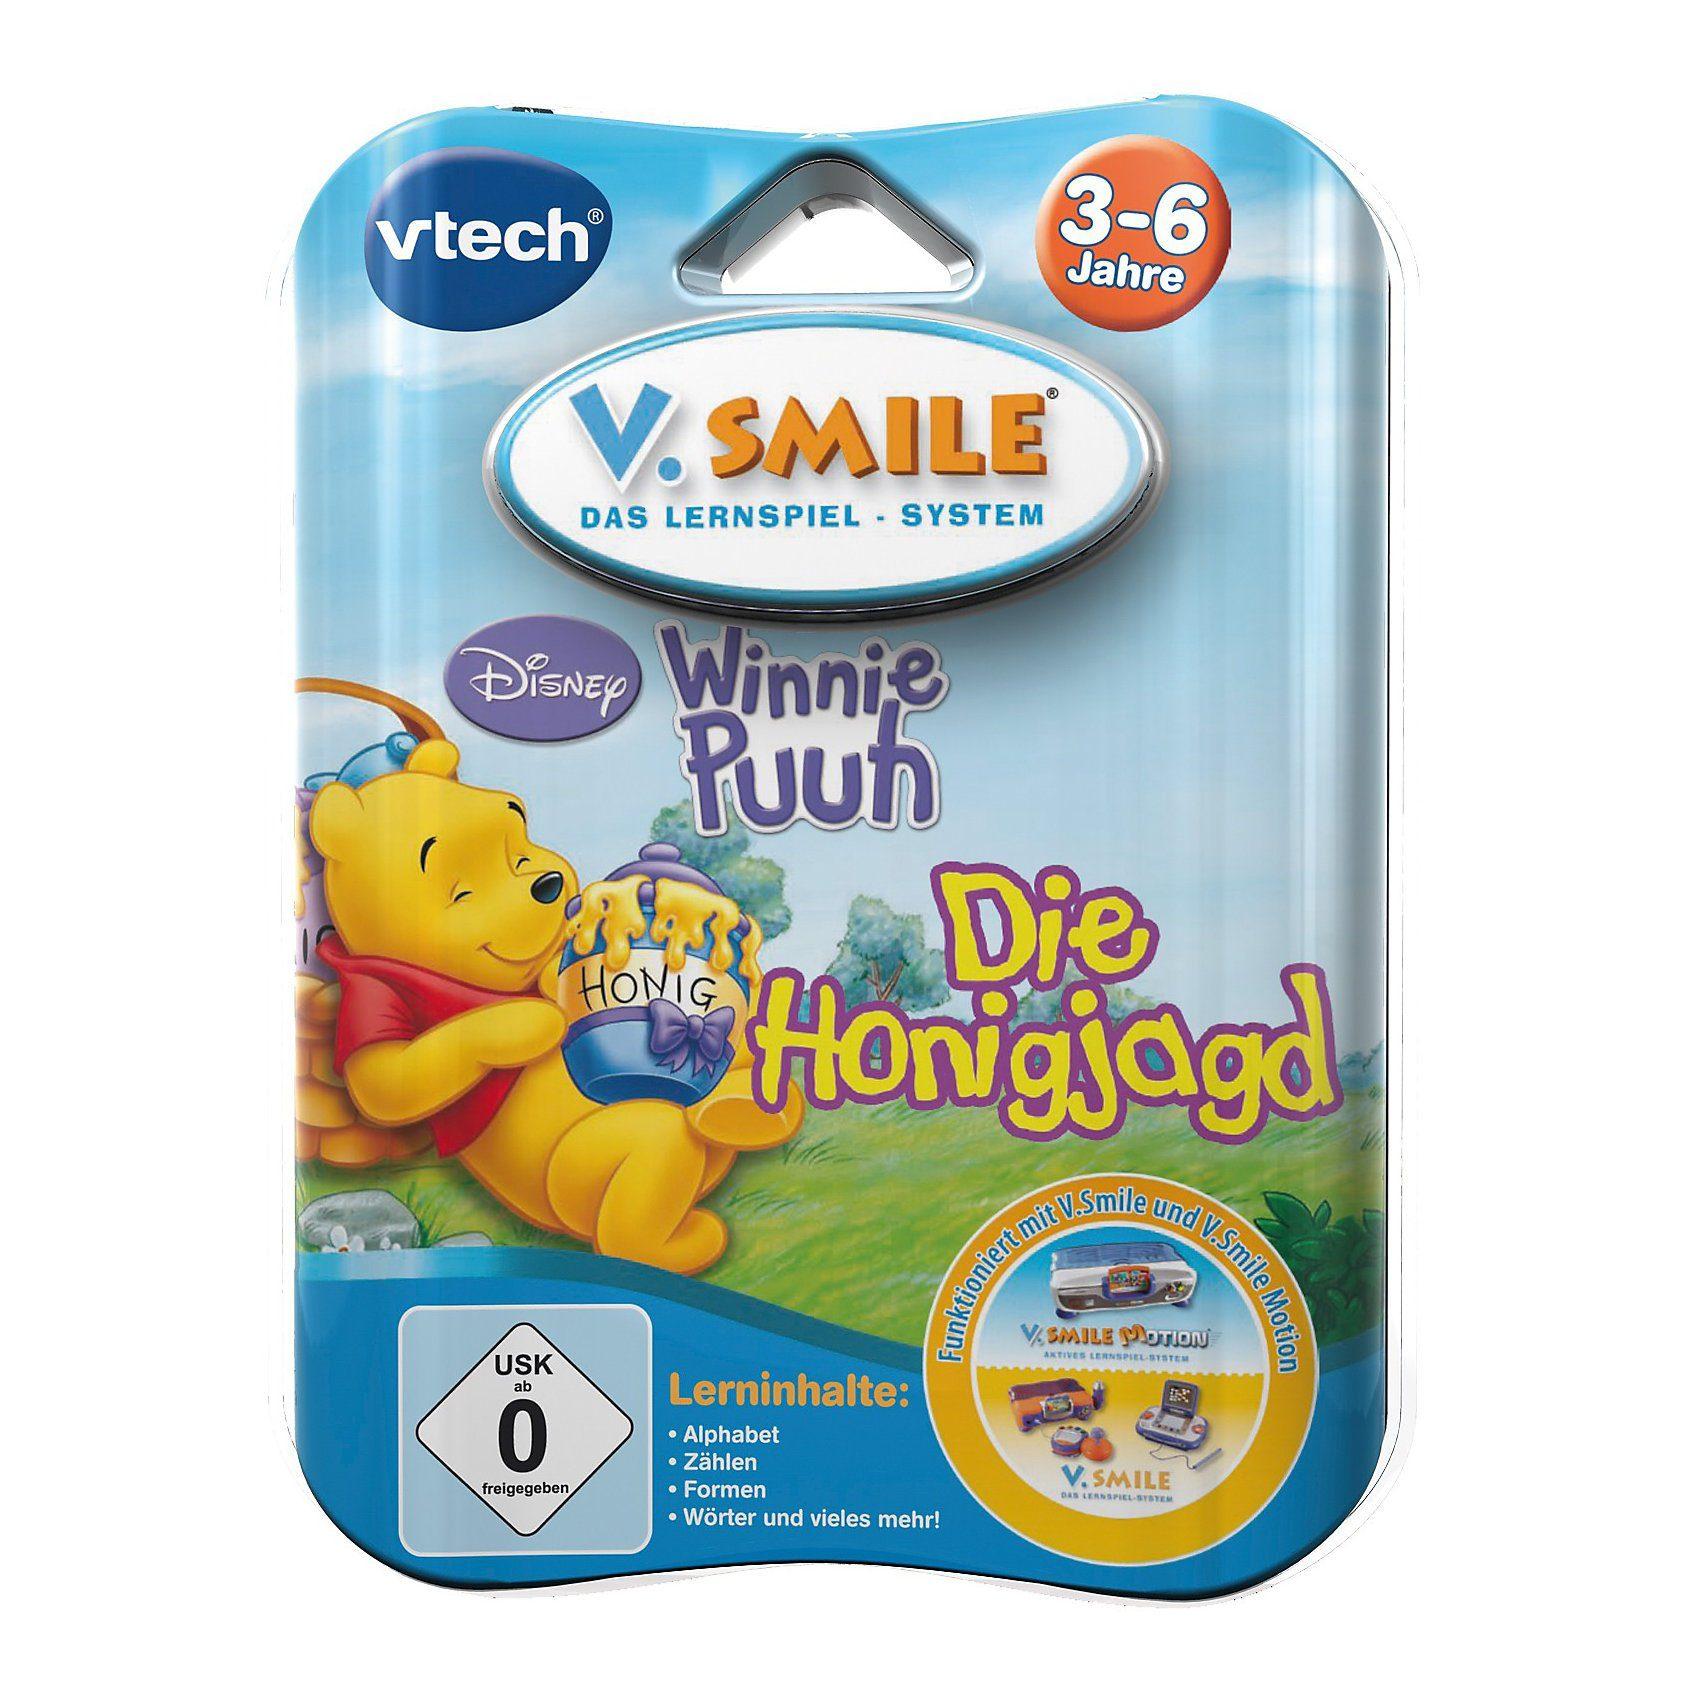 "Vtech V.Smile Lernspiel ""Winnie Puuh"""